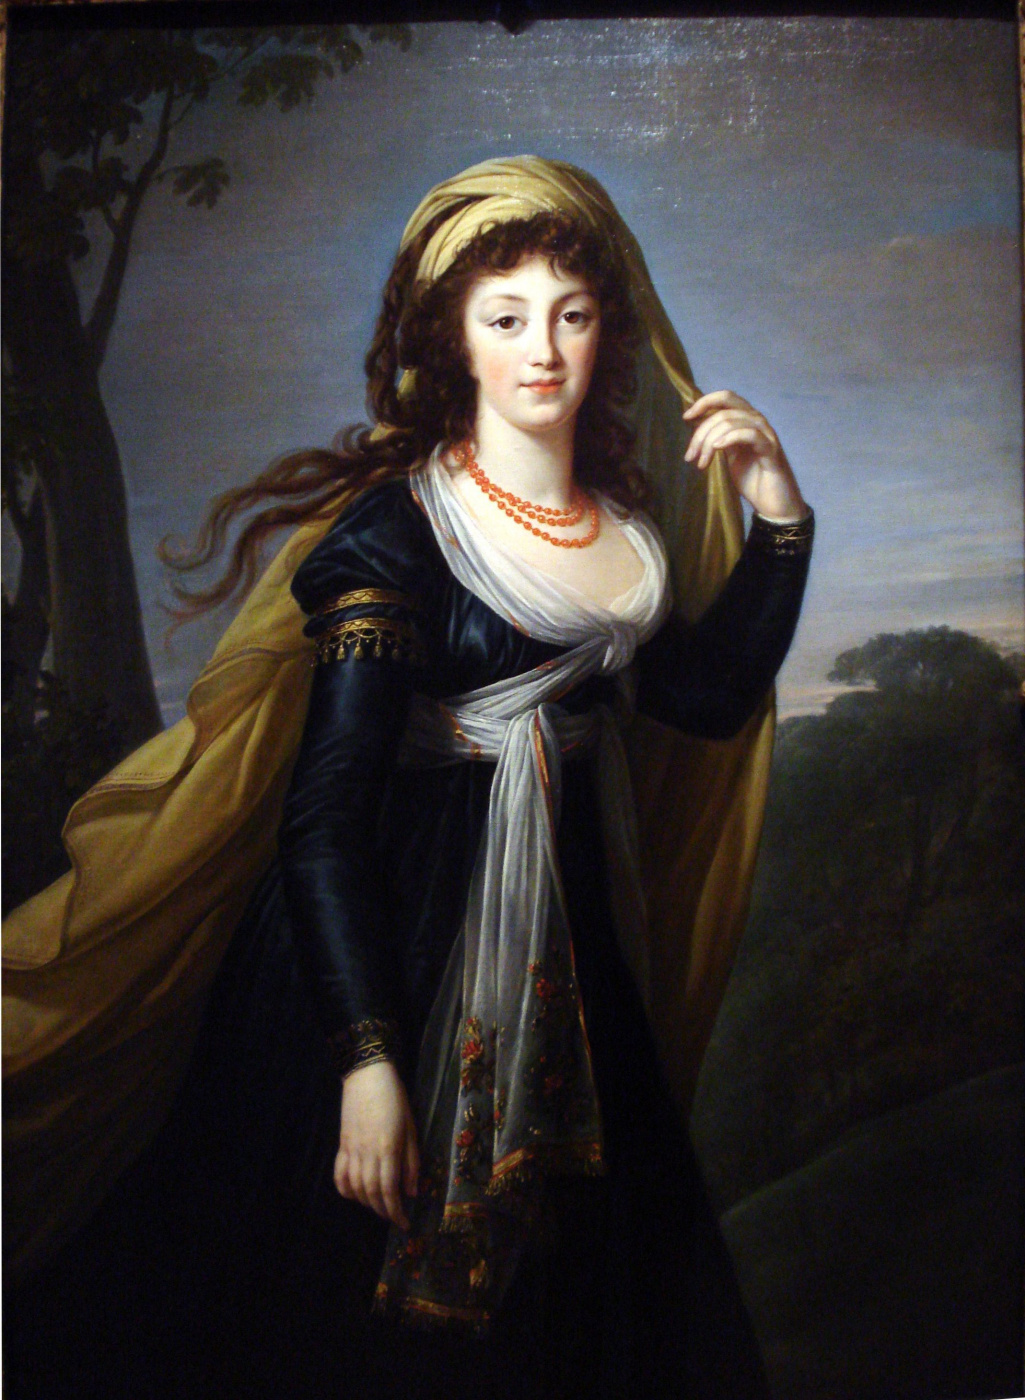 Elizabeth Vigee Le Brun. Theresa, Countess Kinsky